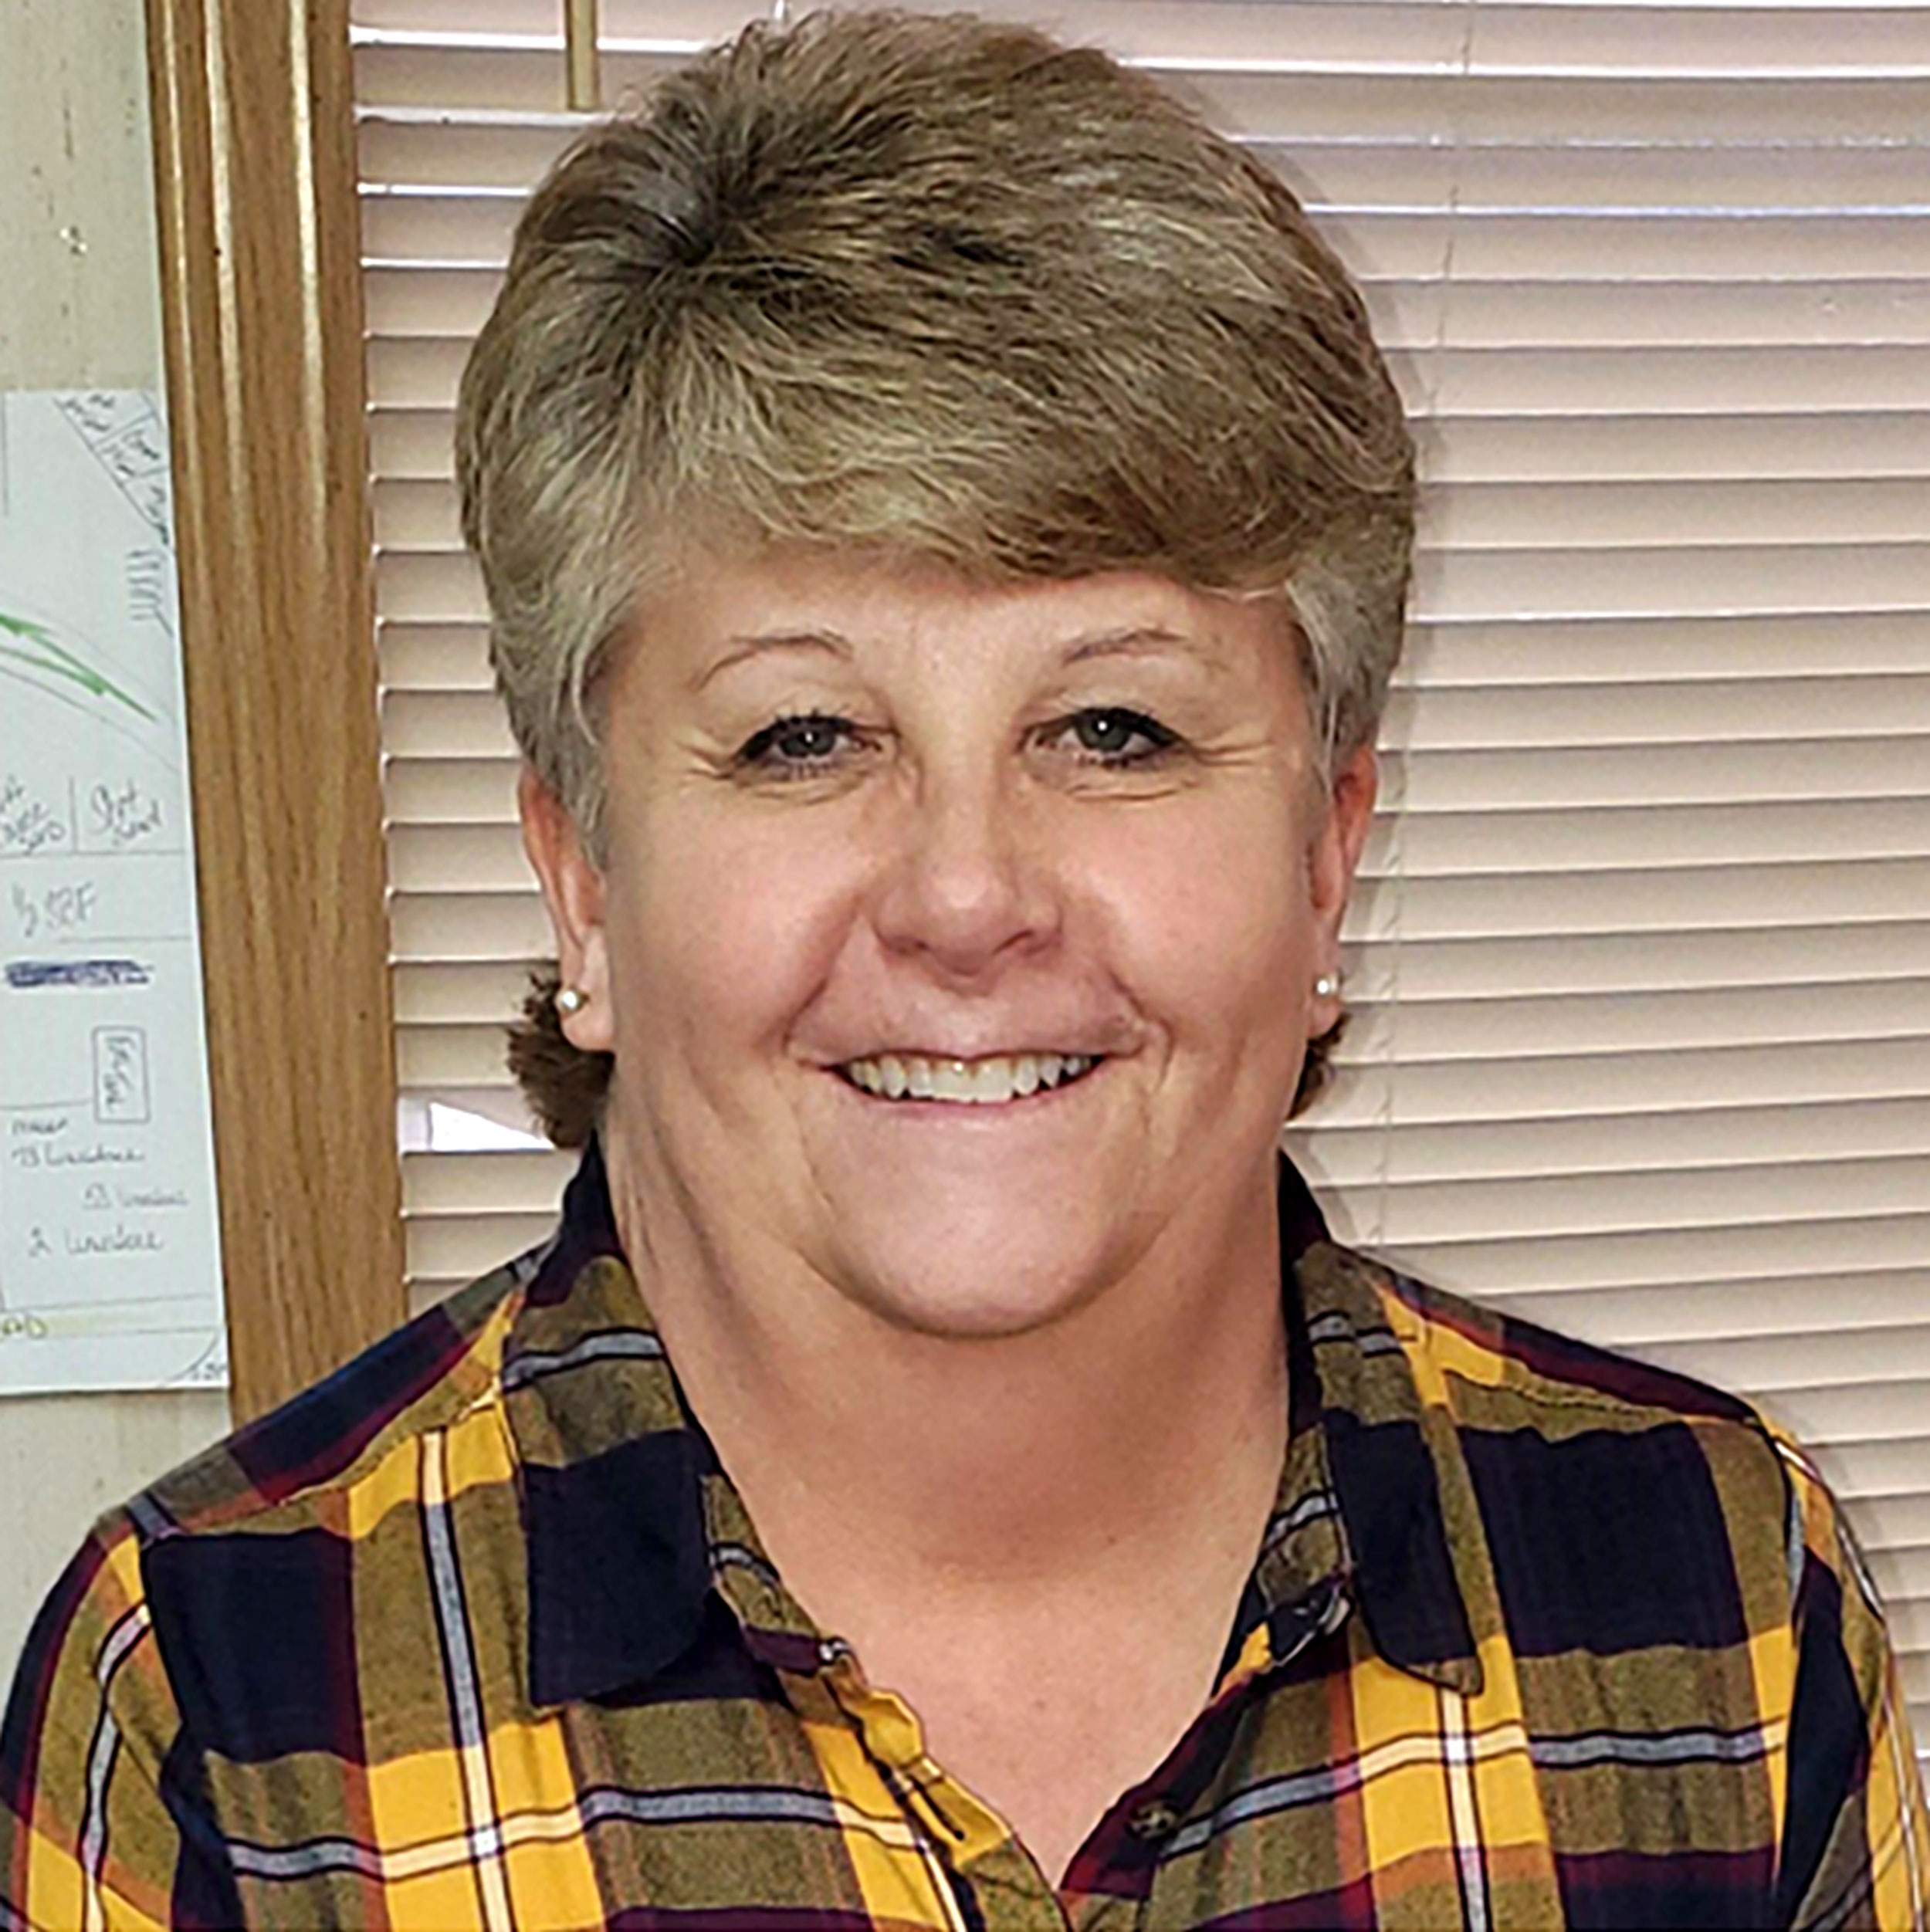 Photo of Julie Johnson the Plant Clerk